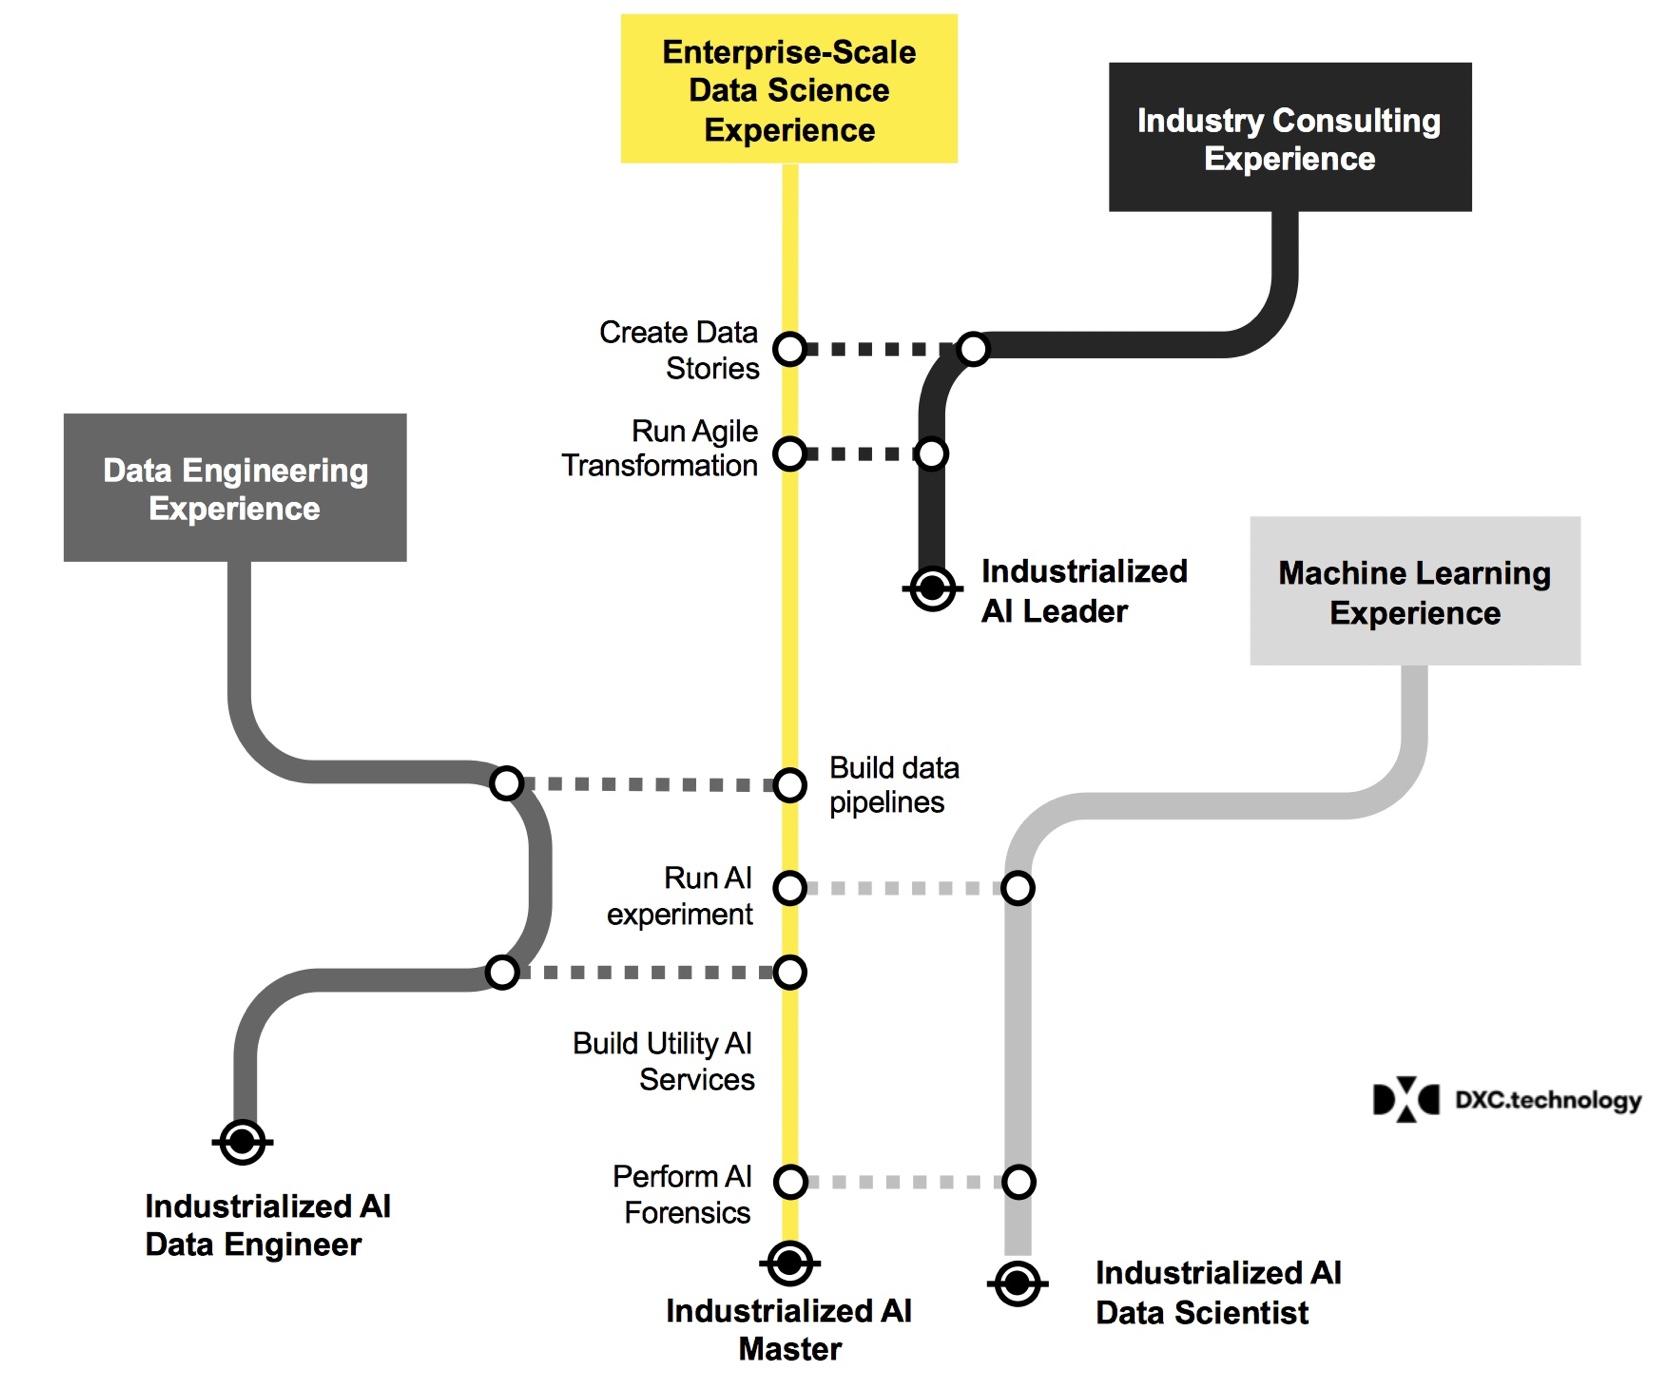 Enterprise data science